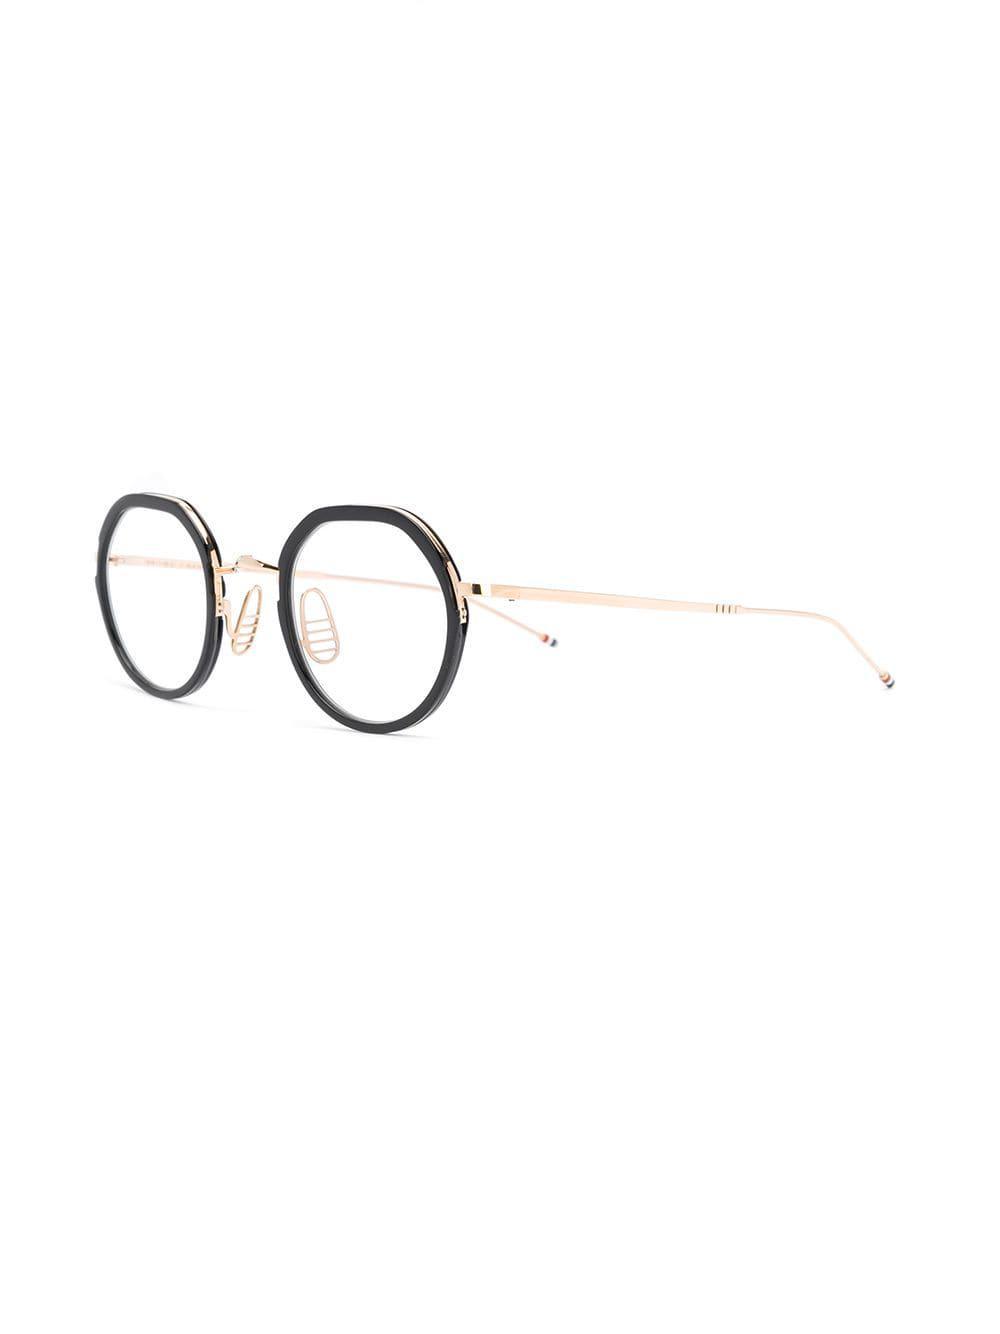 cd46e8801ab1 Thom Browne - Metallic Round Frame Glasses - Lyst. View fullscreen